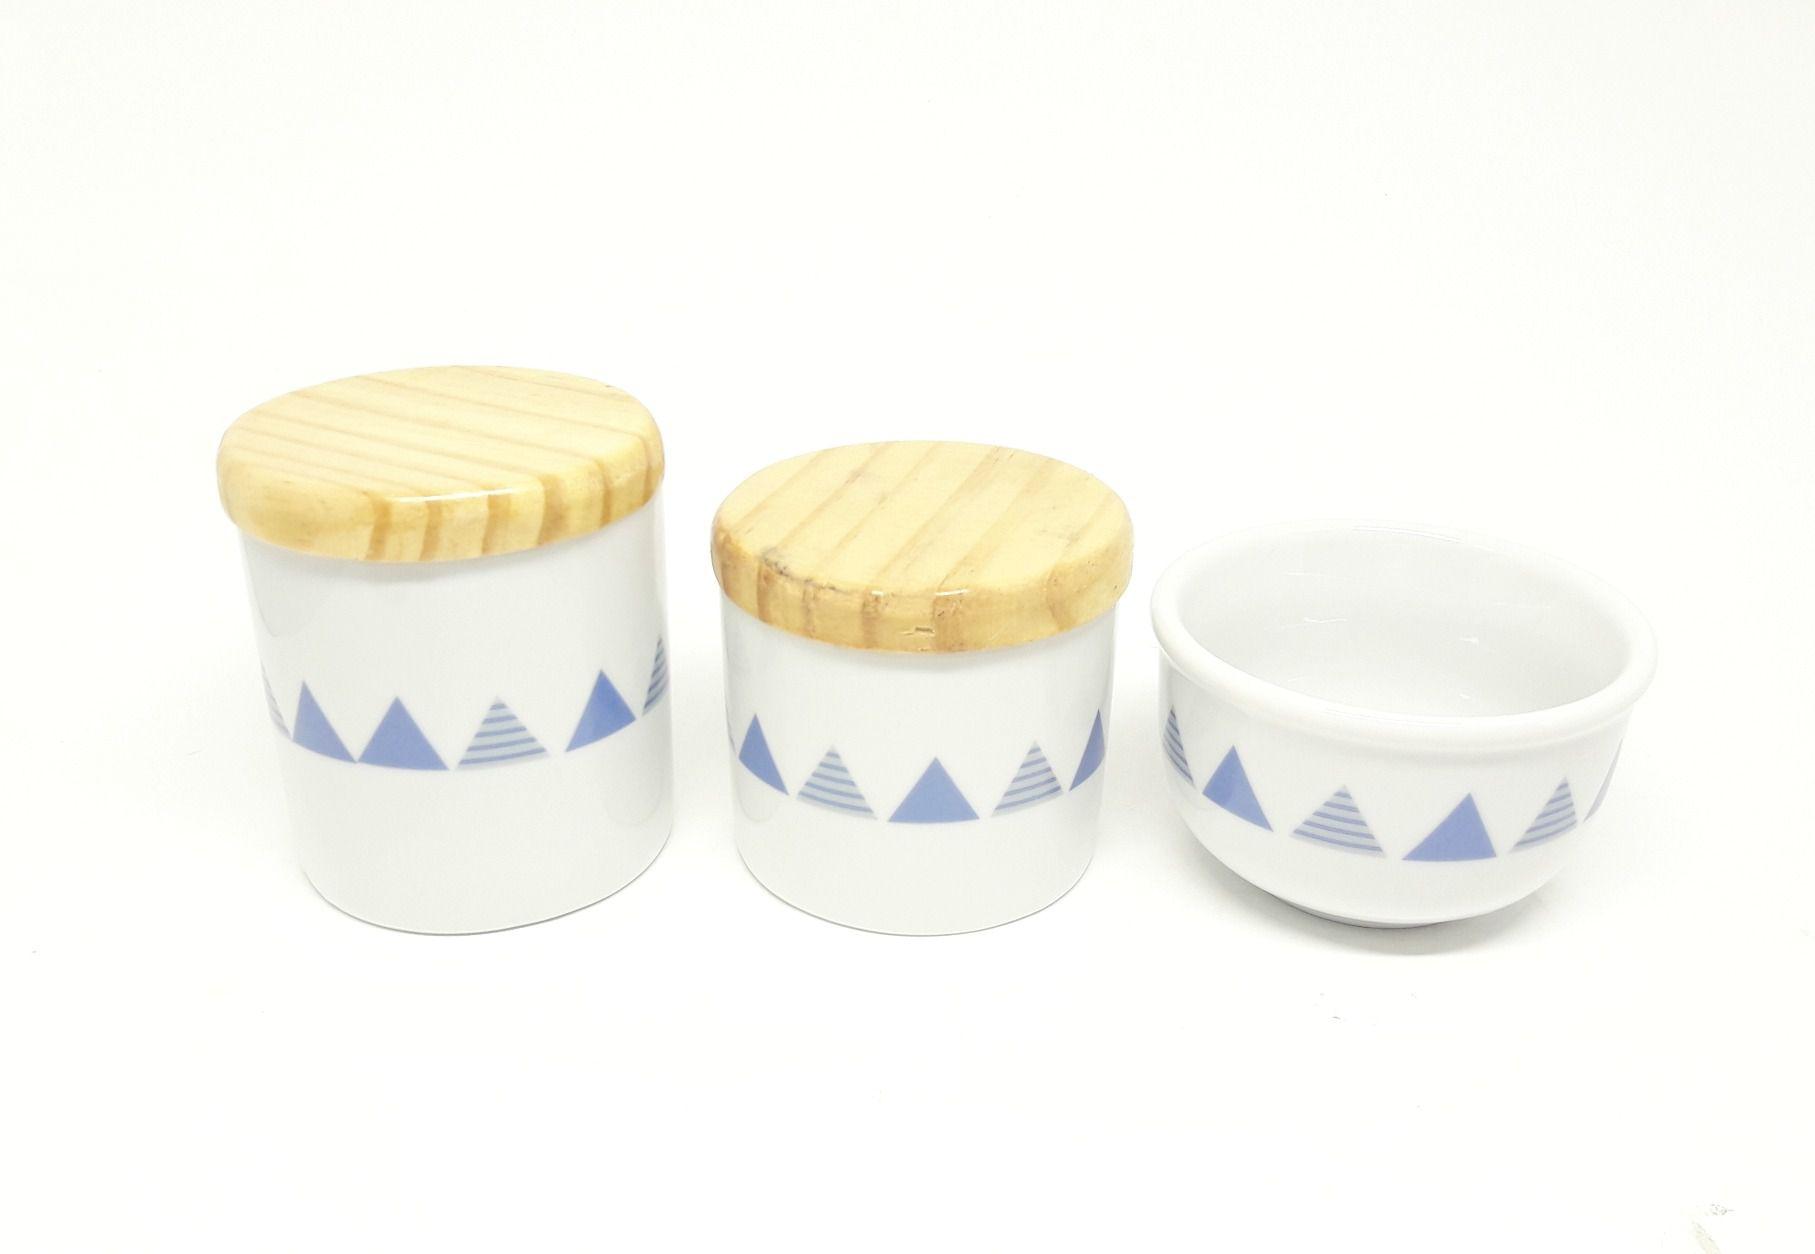 Kit Higiene Bebê Porcelana Geométrico|Triângulos| Bandeirinhas| Tampas Madeira Pinus